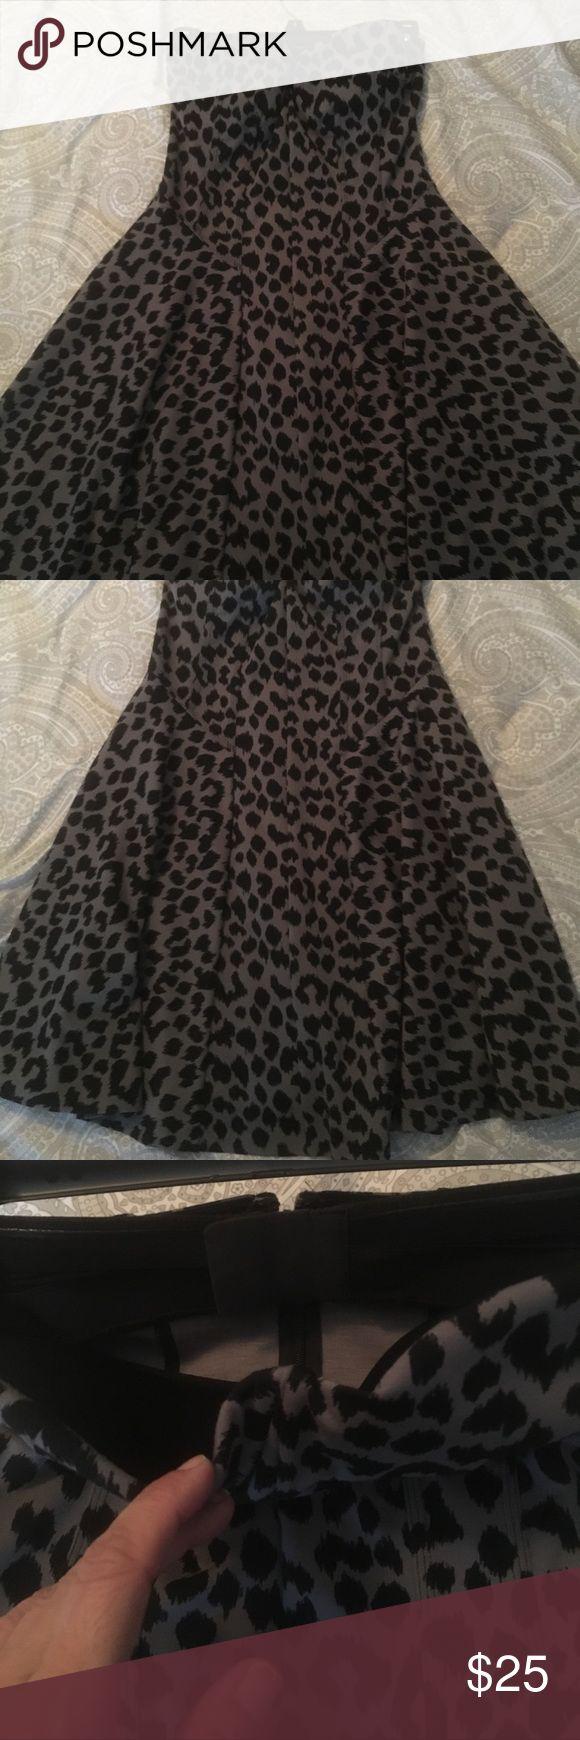 Like new! Strapless VS animal print dress Strapless grey and black animal print mini dress, built in bra, size 34A, cotton, full skirt. Comfortable and cute! Victoria's Secret Dresses Mini